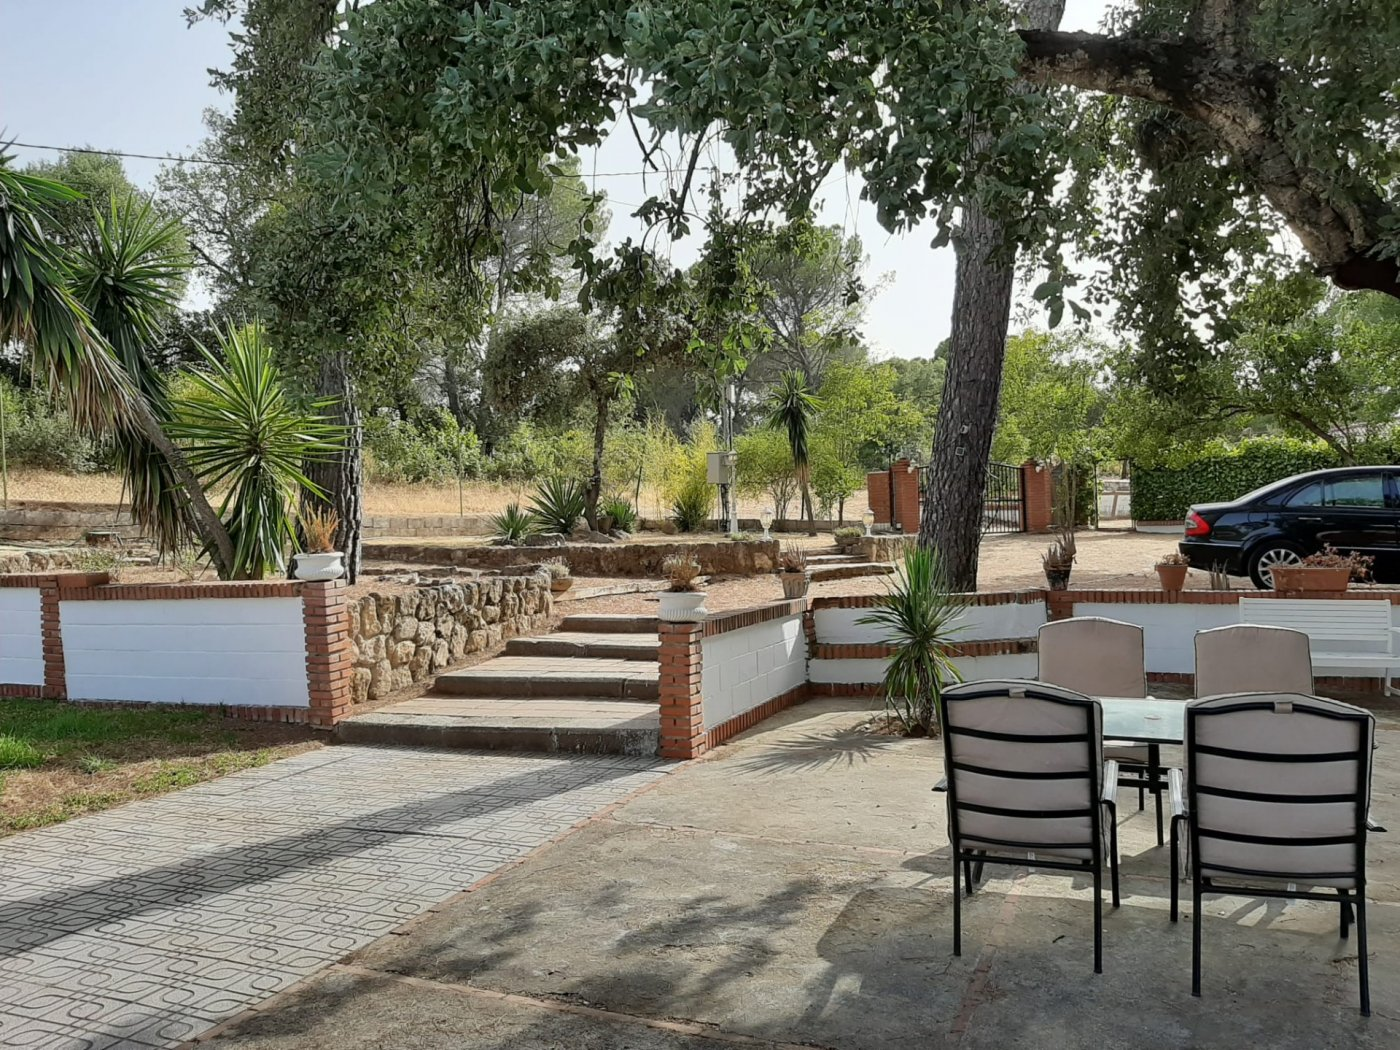 Estupenda casa con piscina propia en zona de assuan- las jaras-cÓrdoba. - imagenInmueble7